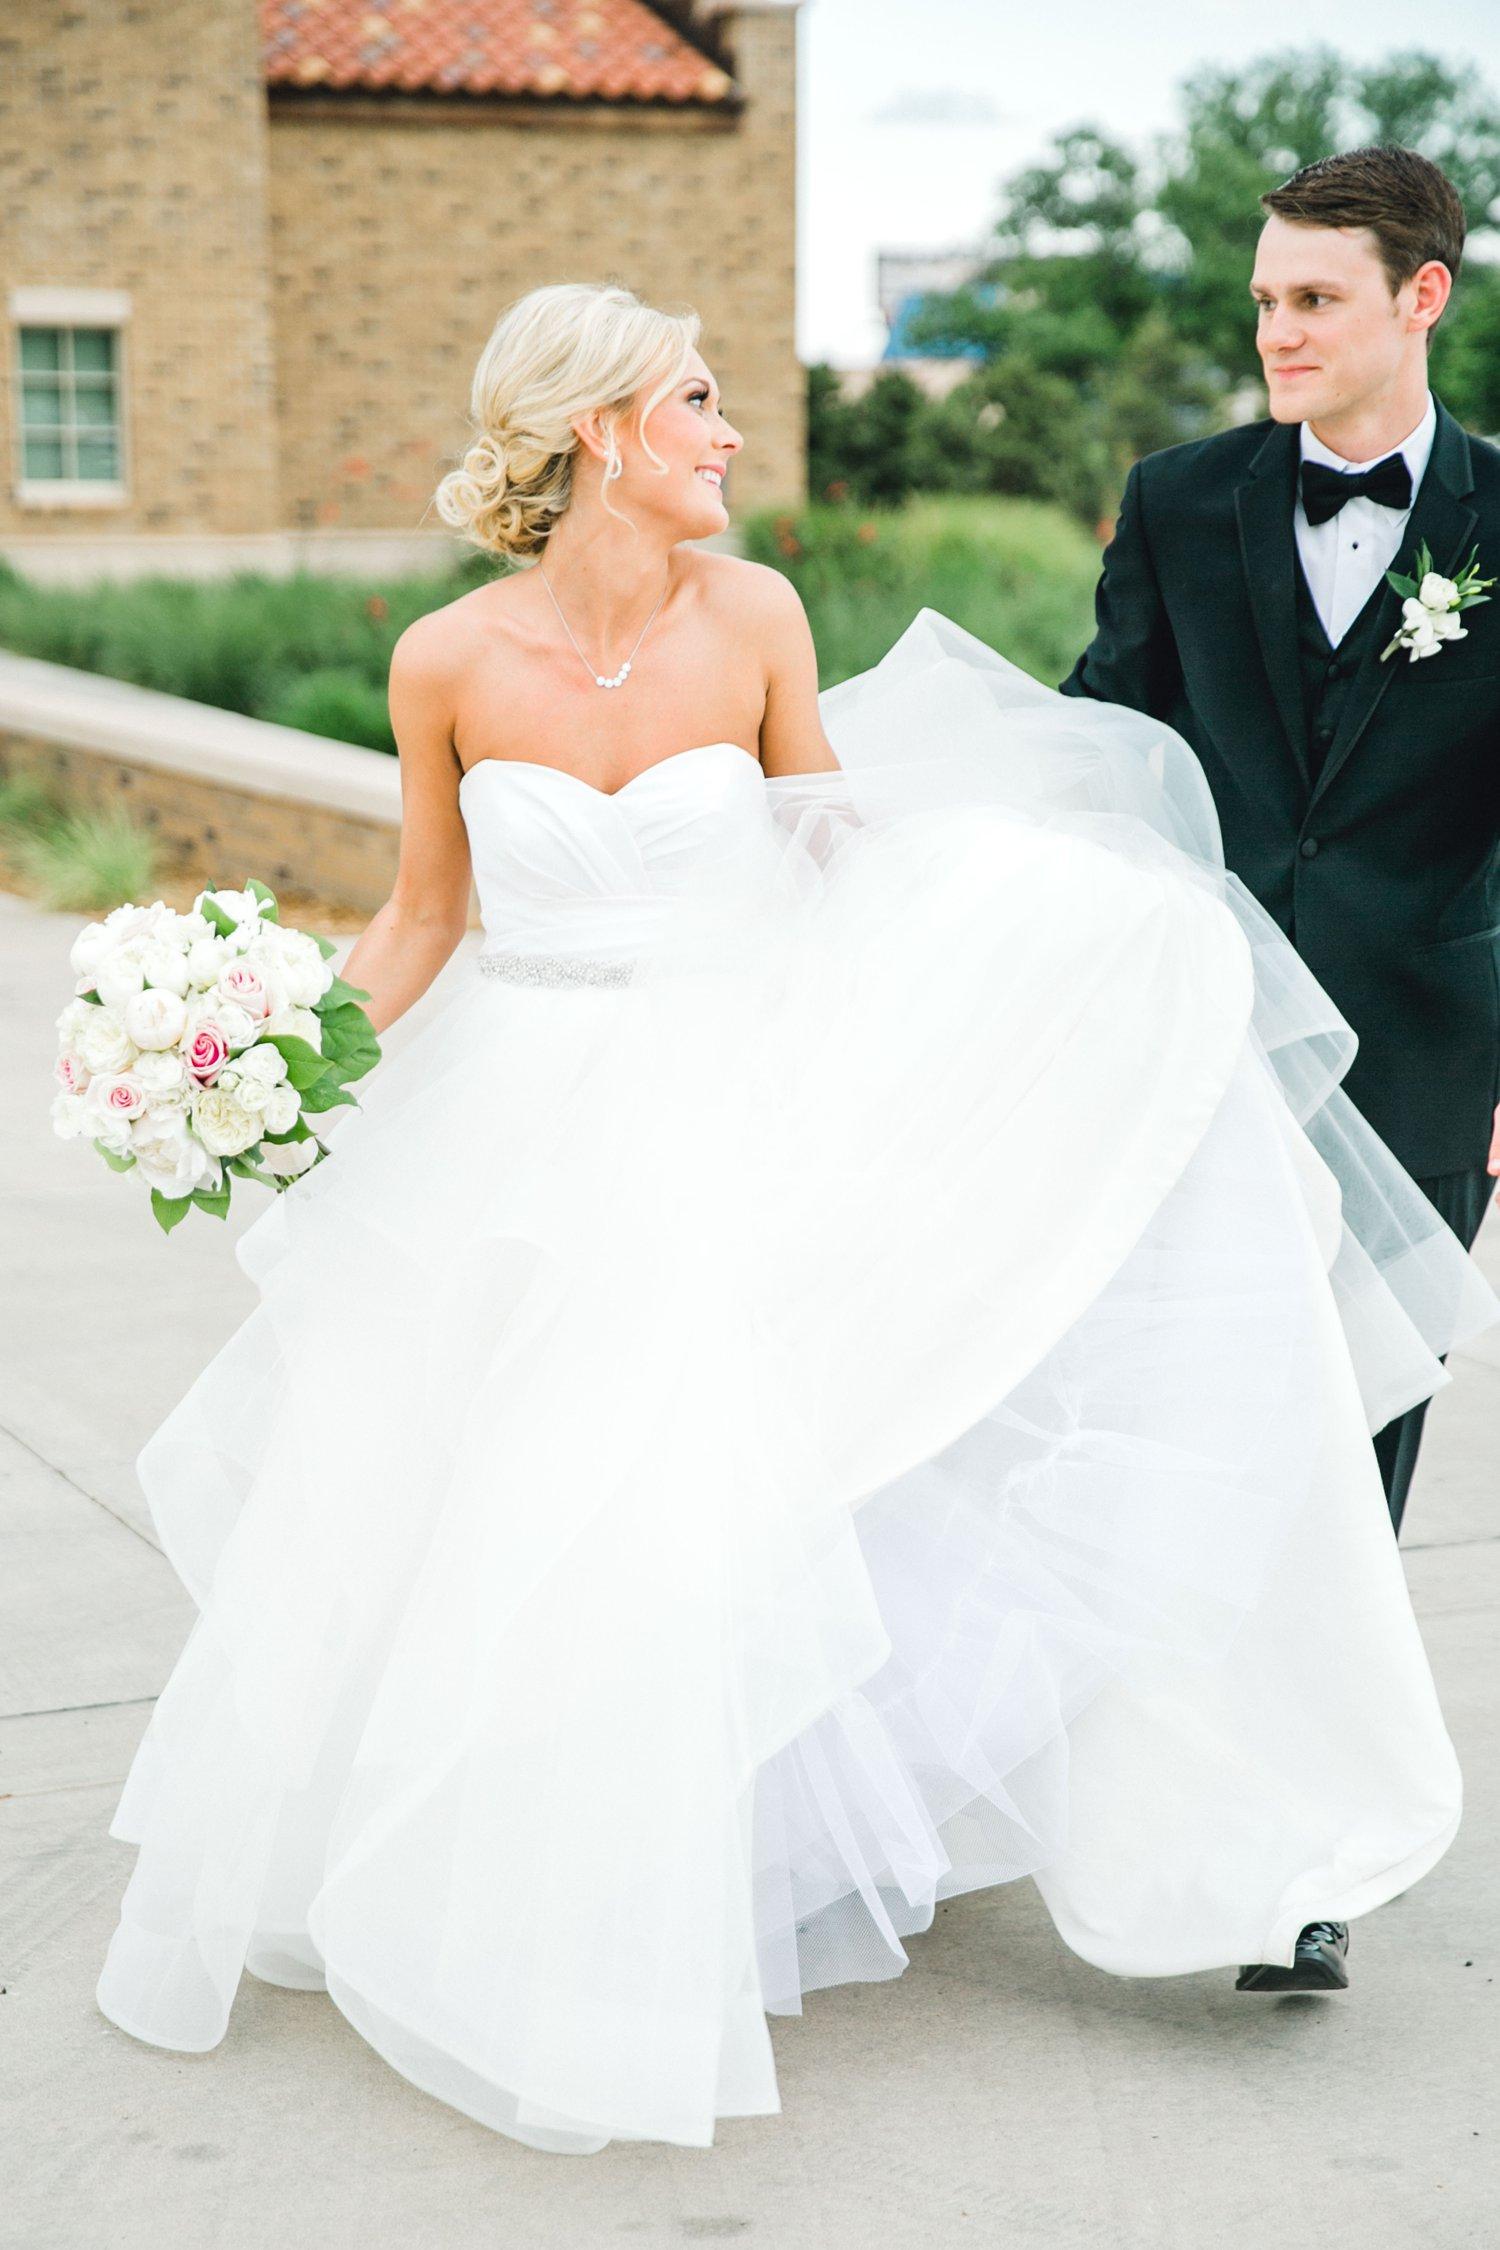 Taylor-and-Brock-Williams-Texas-Tech-University-Merket-Alumni-Center-Lubbock-Photographer-ALLEEJ0165.jpg